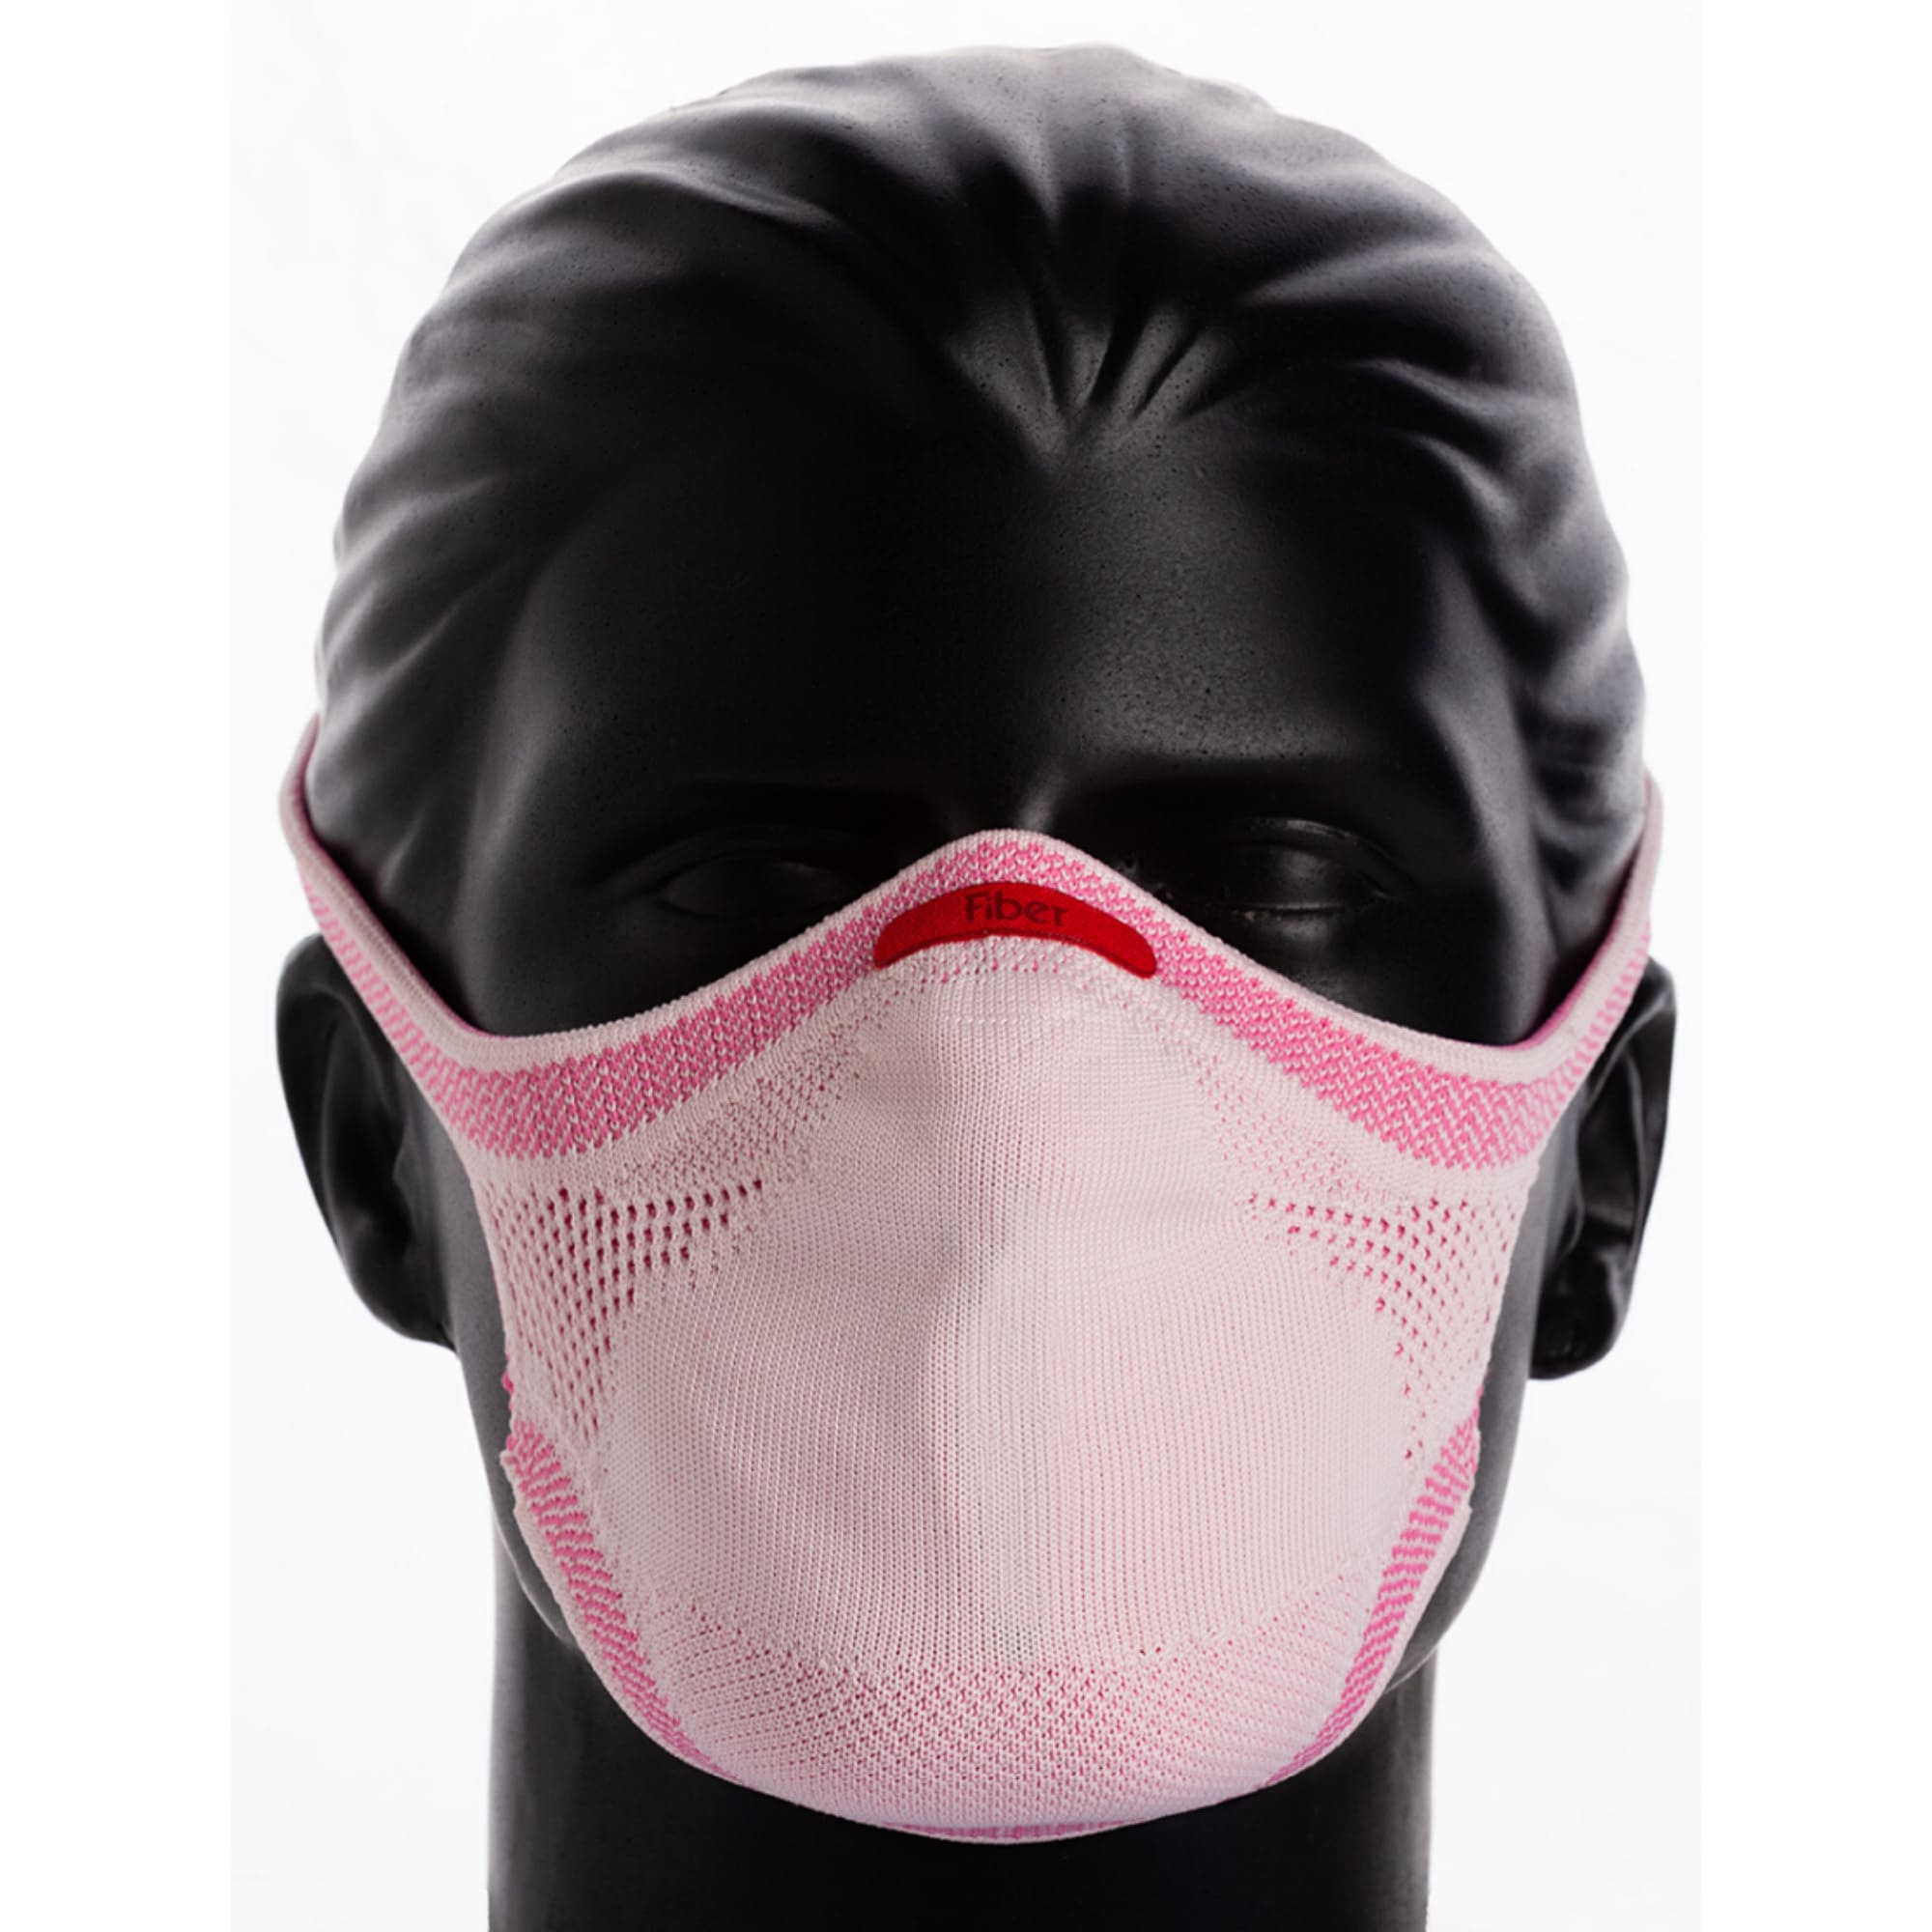 KIT Máscara Rosa + Refil de Filtro + Suporte